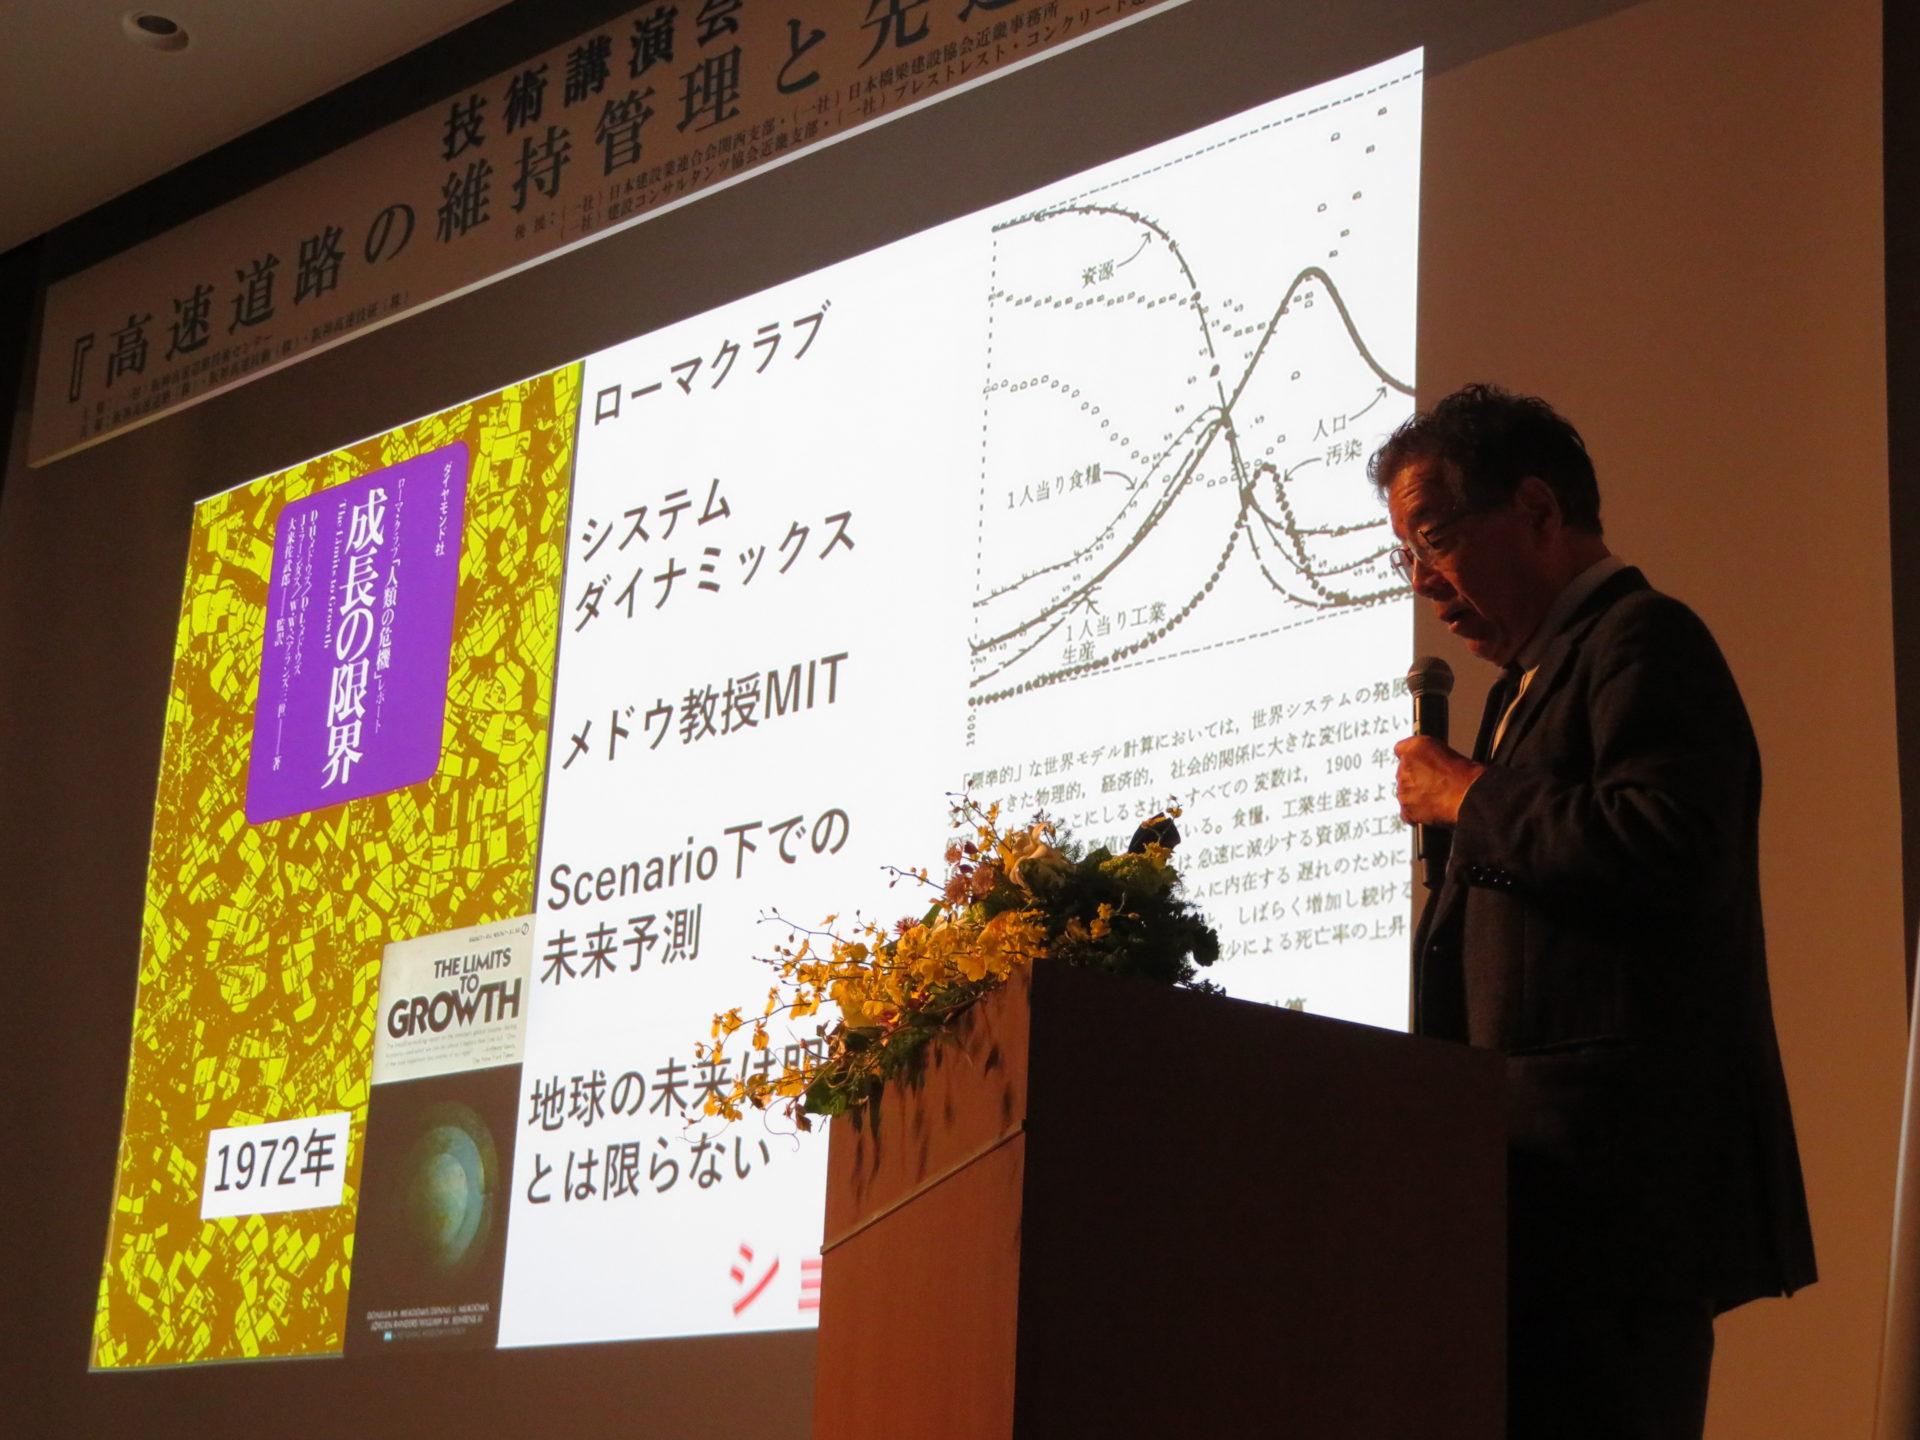 技術講演会『高速道路の維持管理と先進技術』